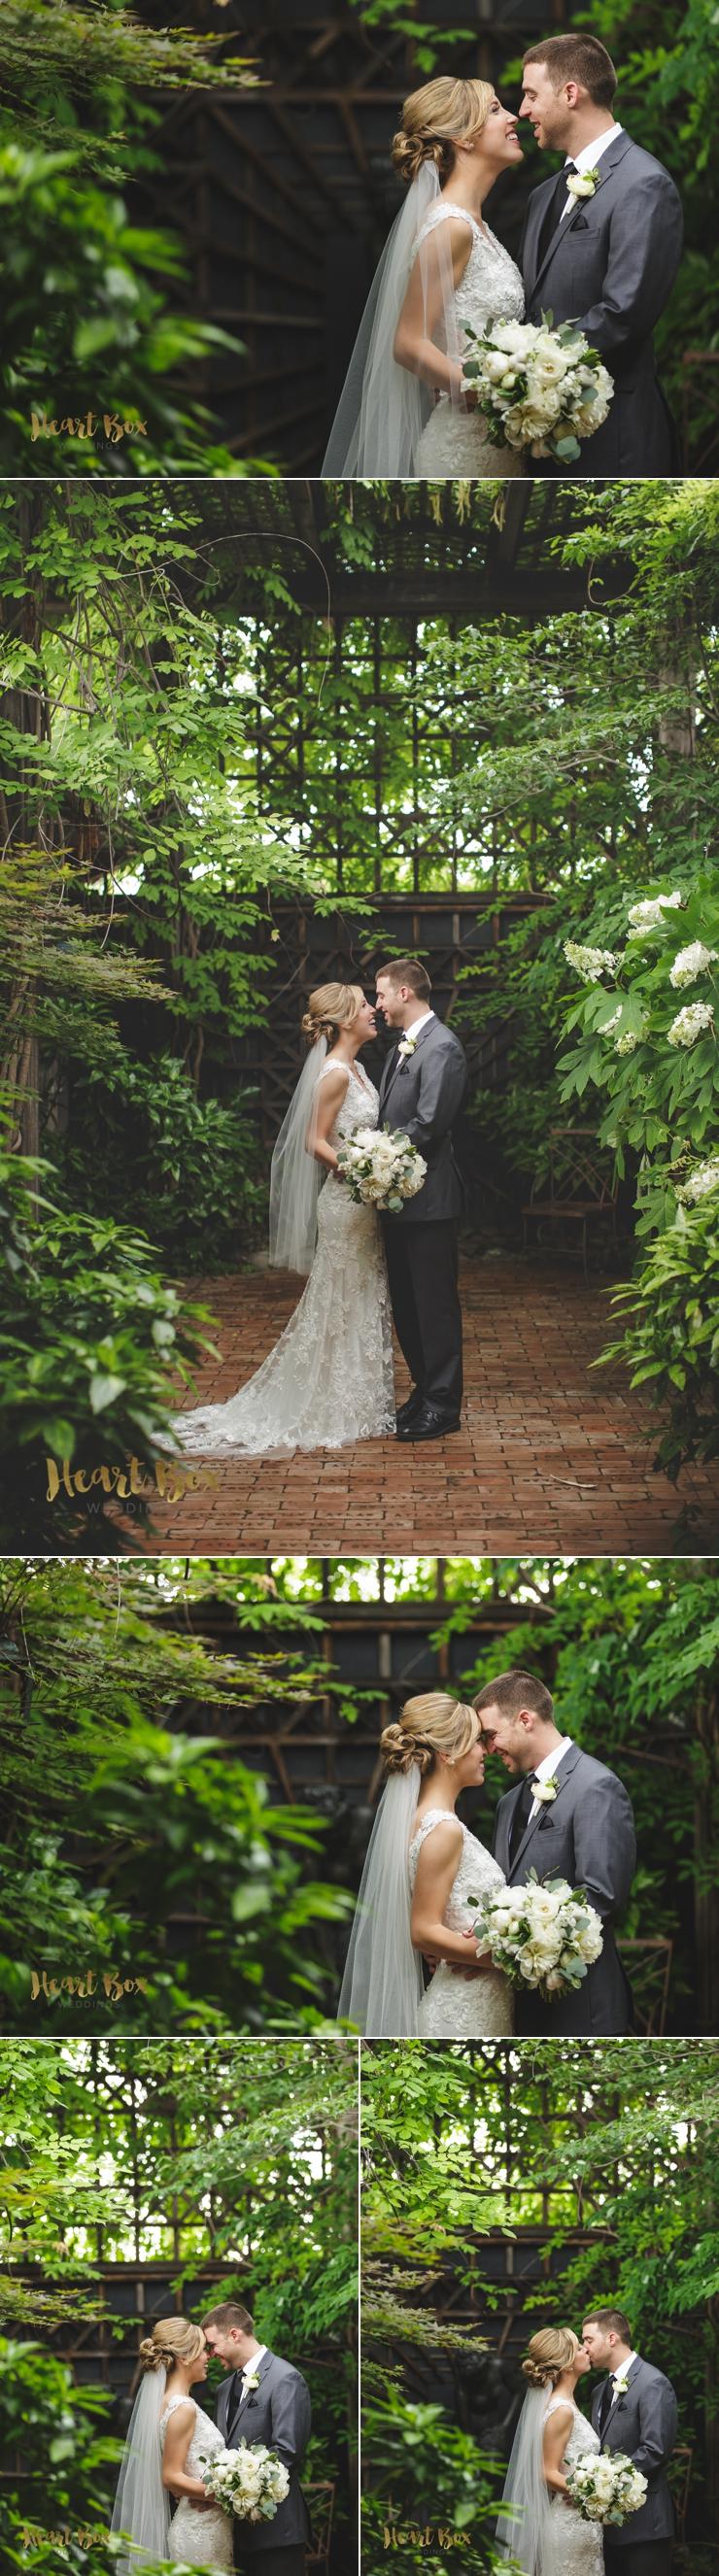 Popplewell Wedding Blog Collages 14.jpg